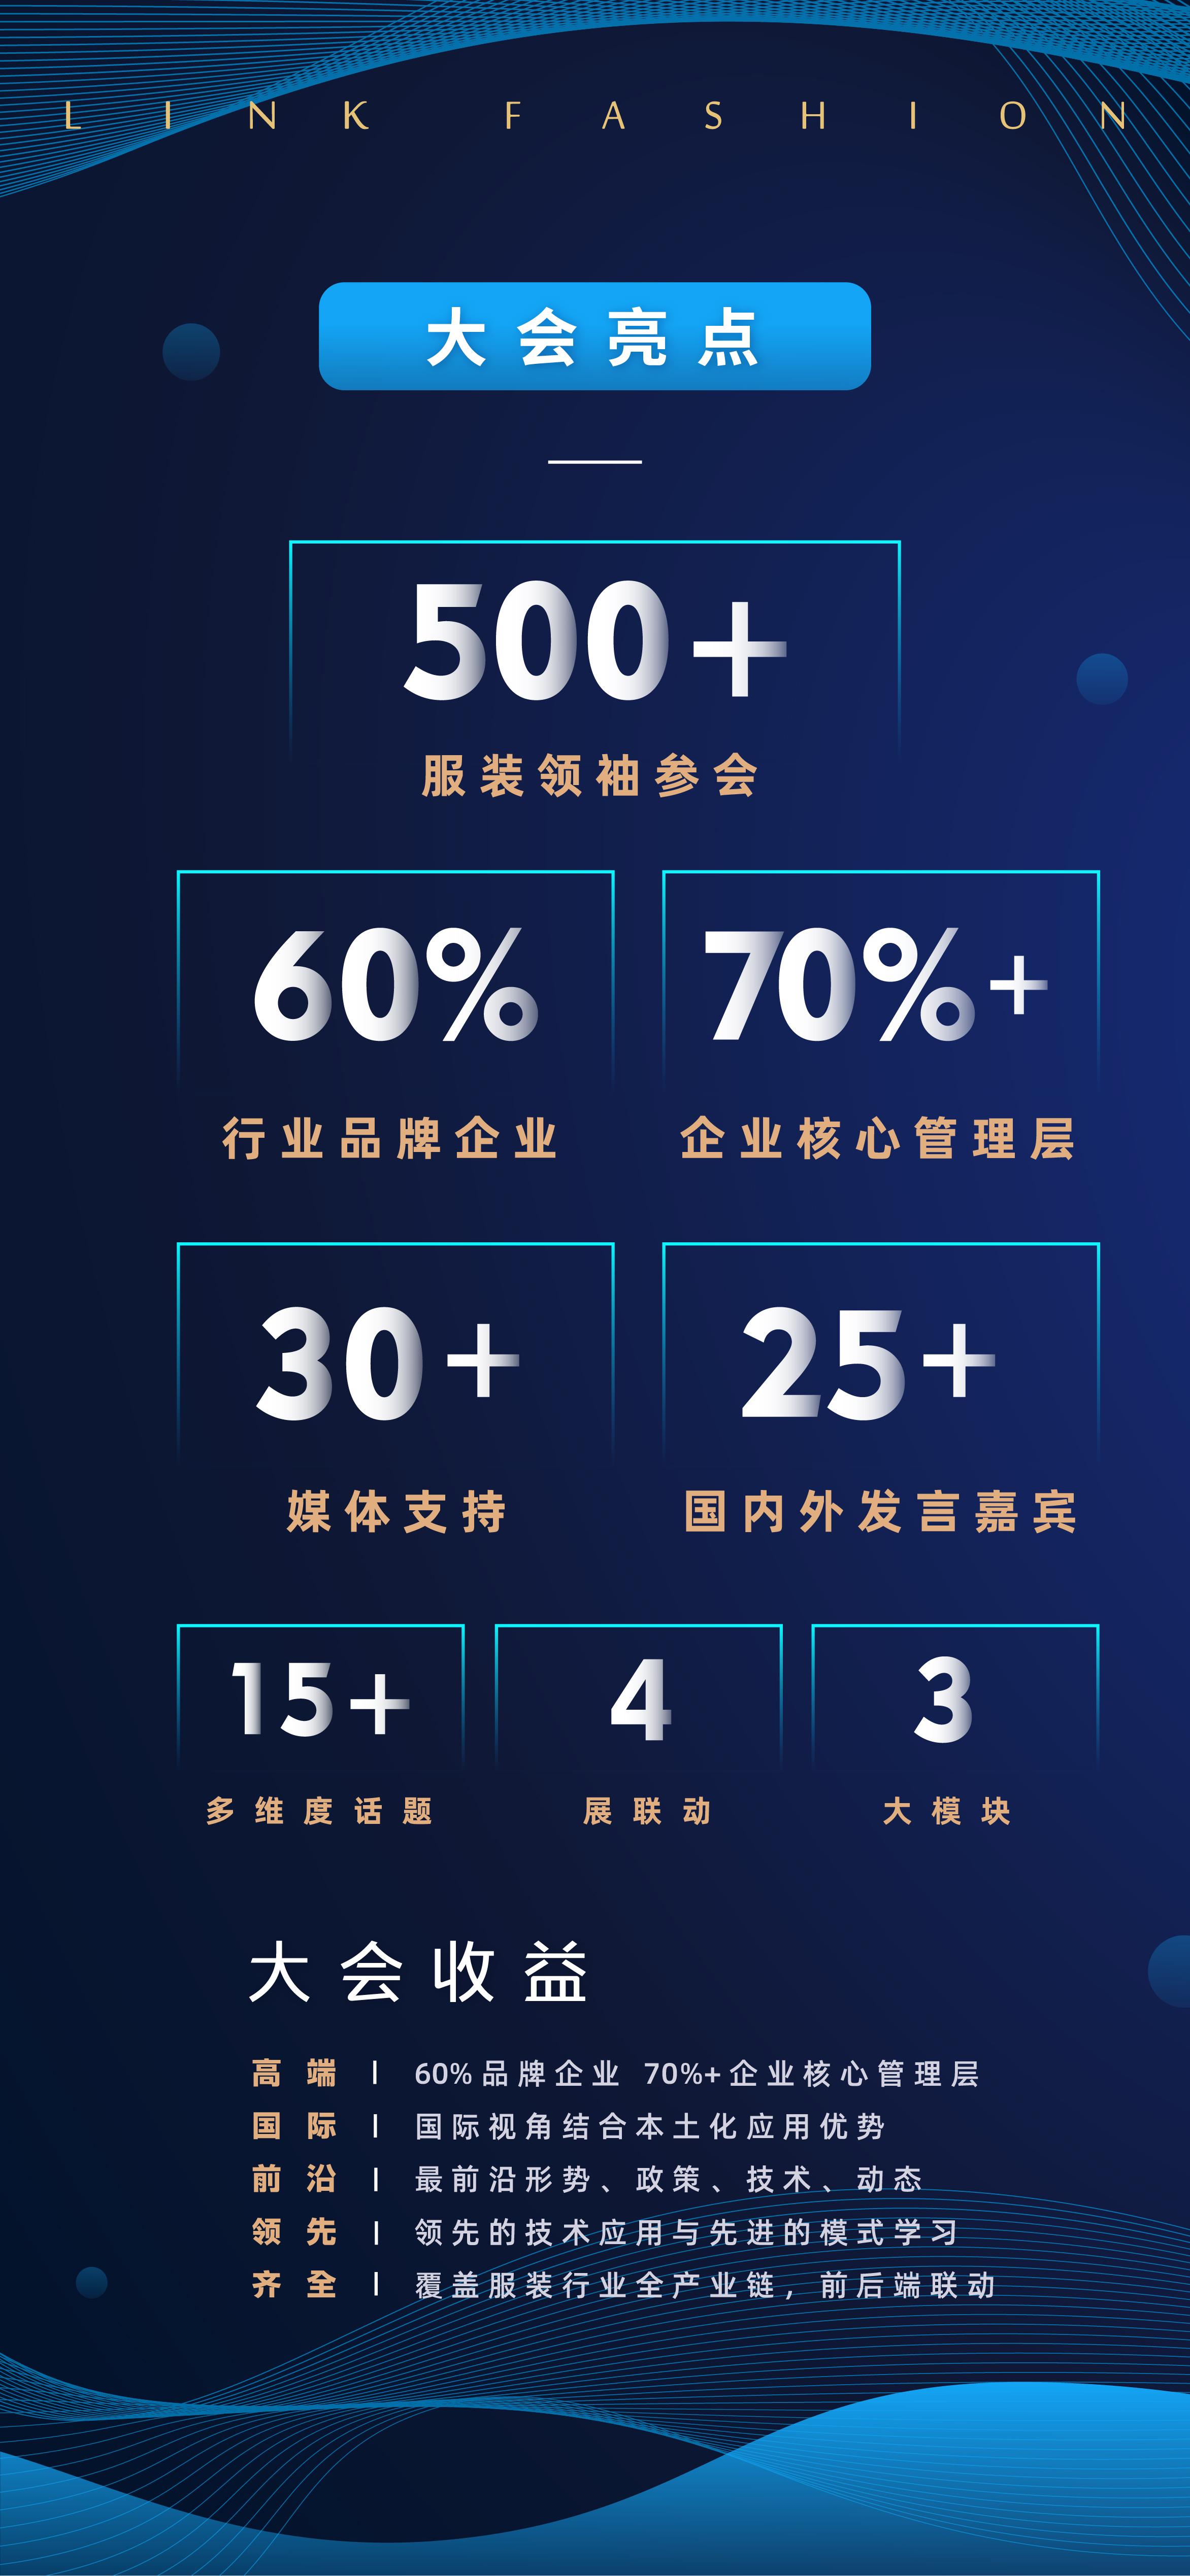 2020 LINK FASHION 全球服裝產業領袖峰會(上海)